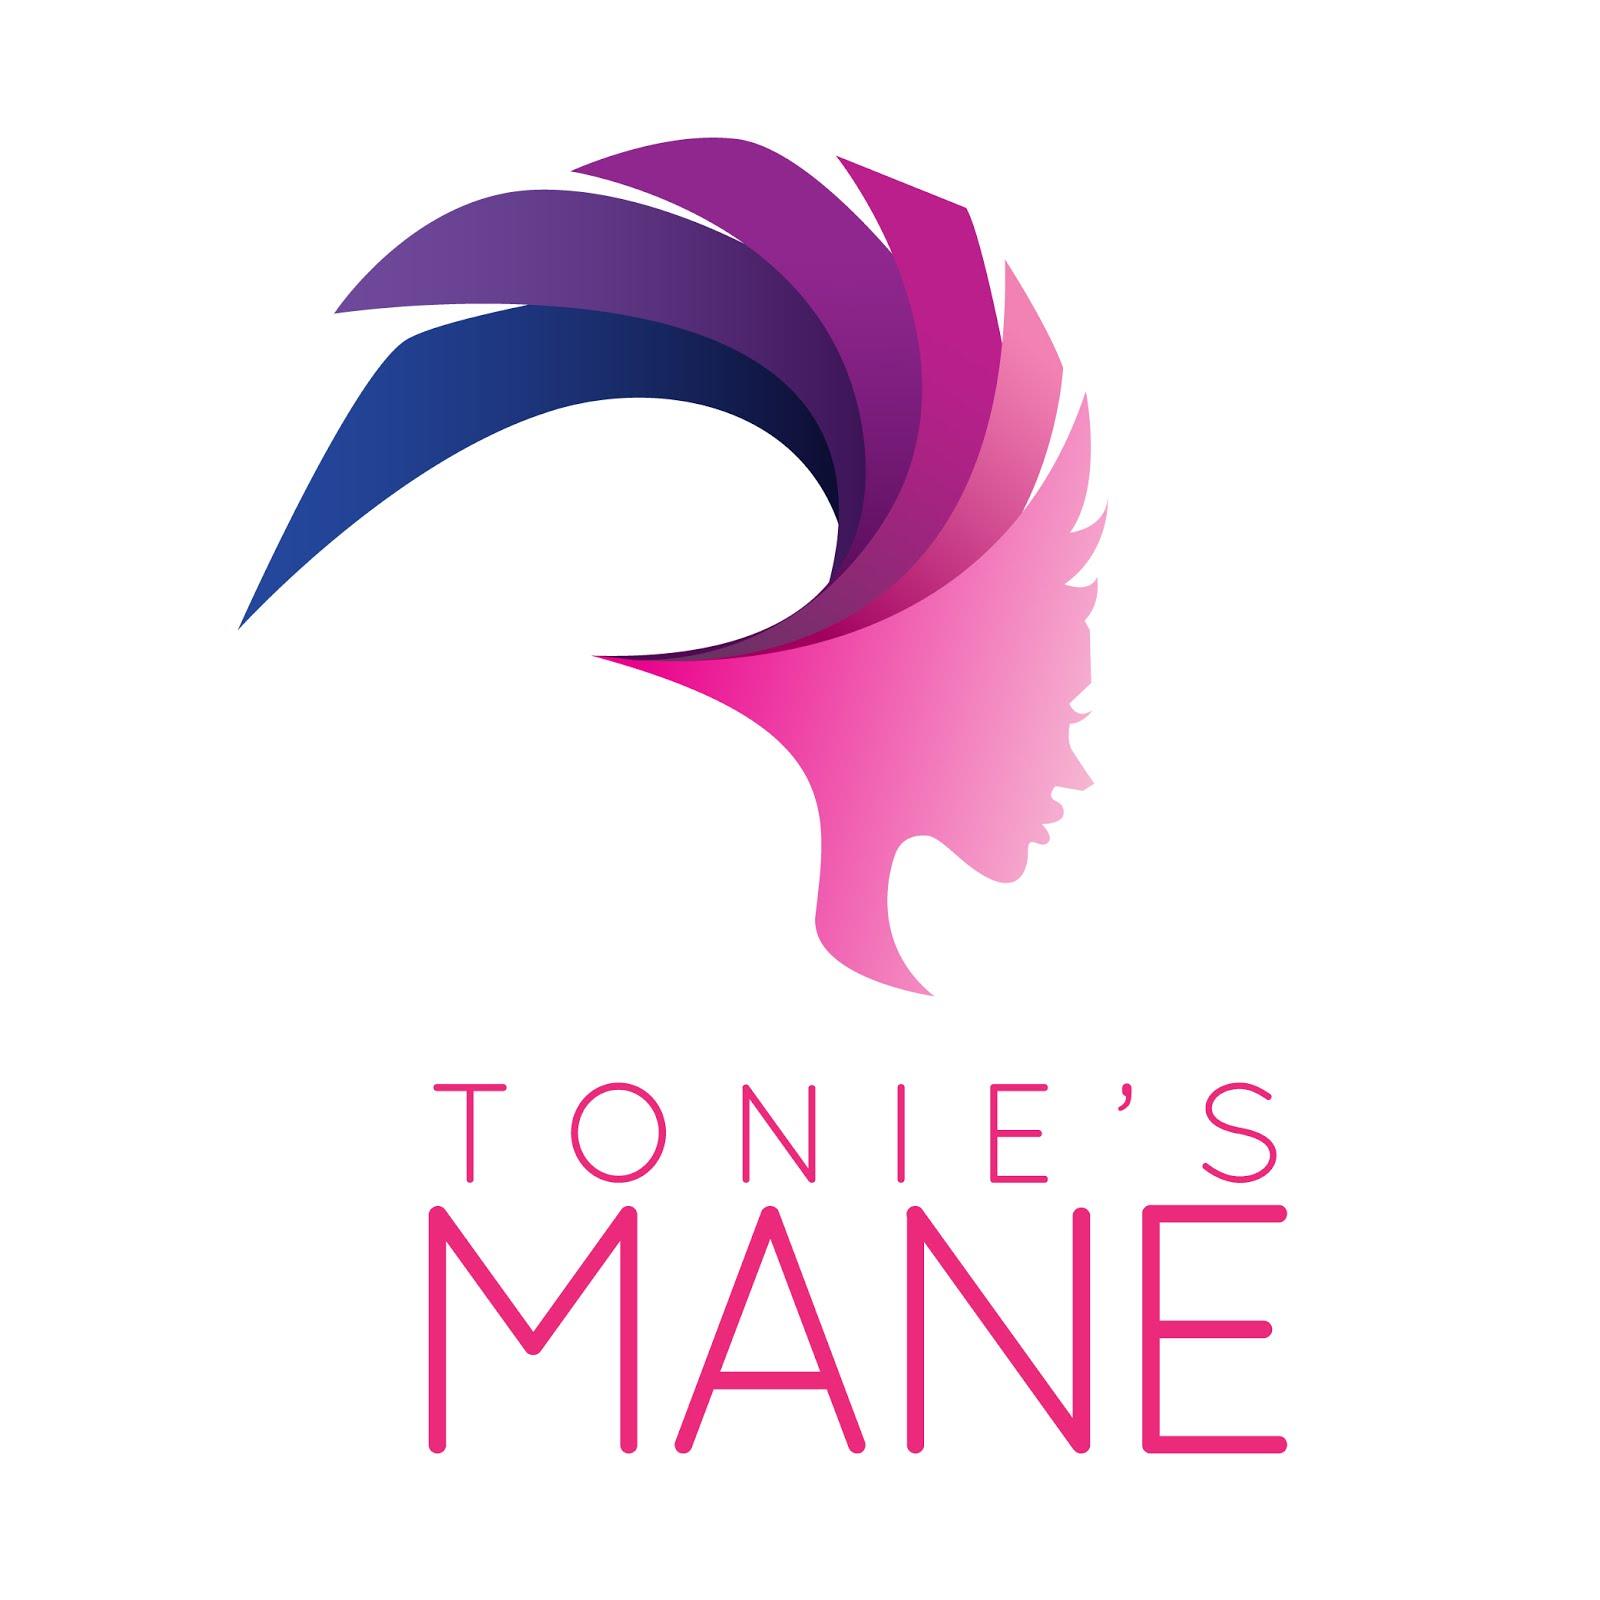 Tonie's Mane